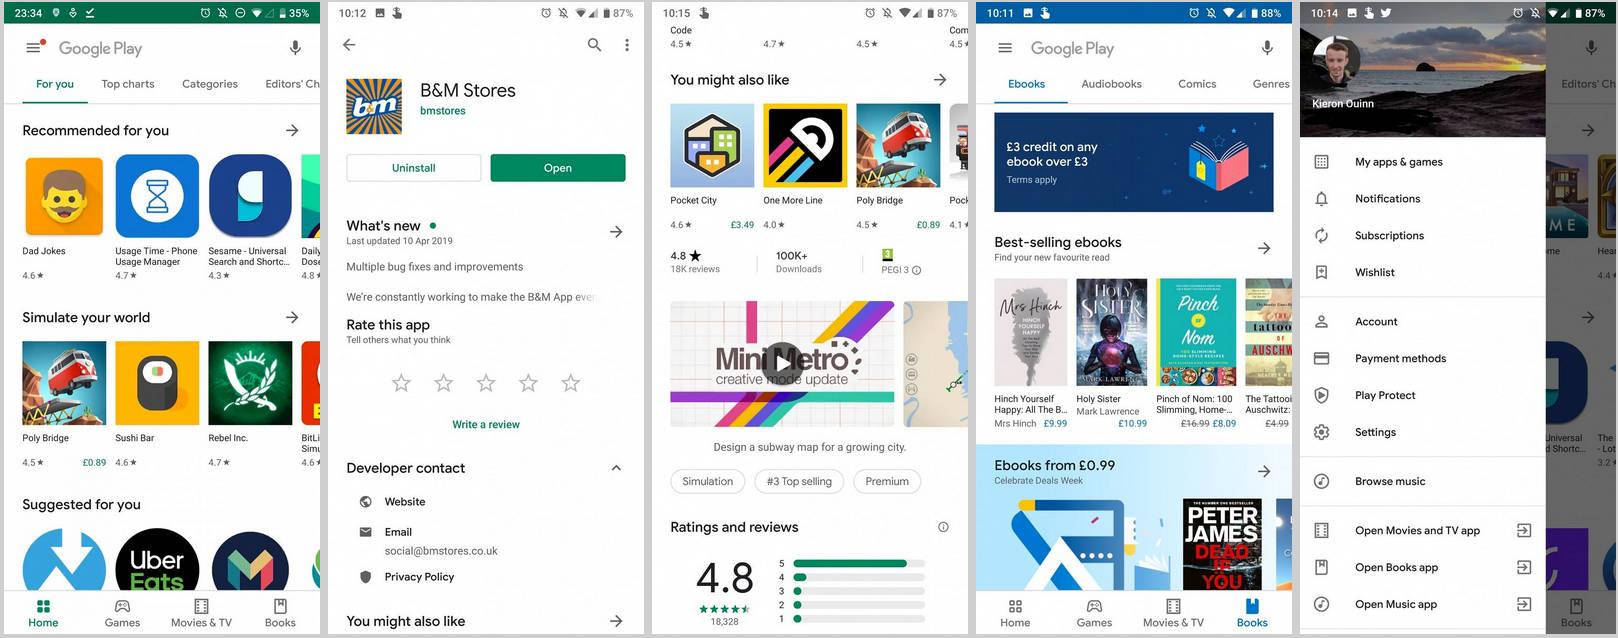 Sklep Play Material Theme Android Q APEX kiedy Google I/O 2019